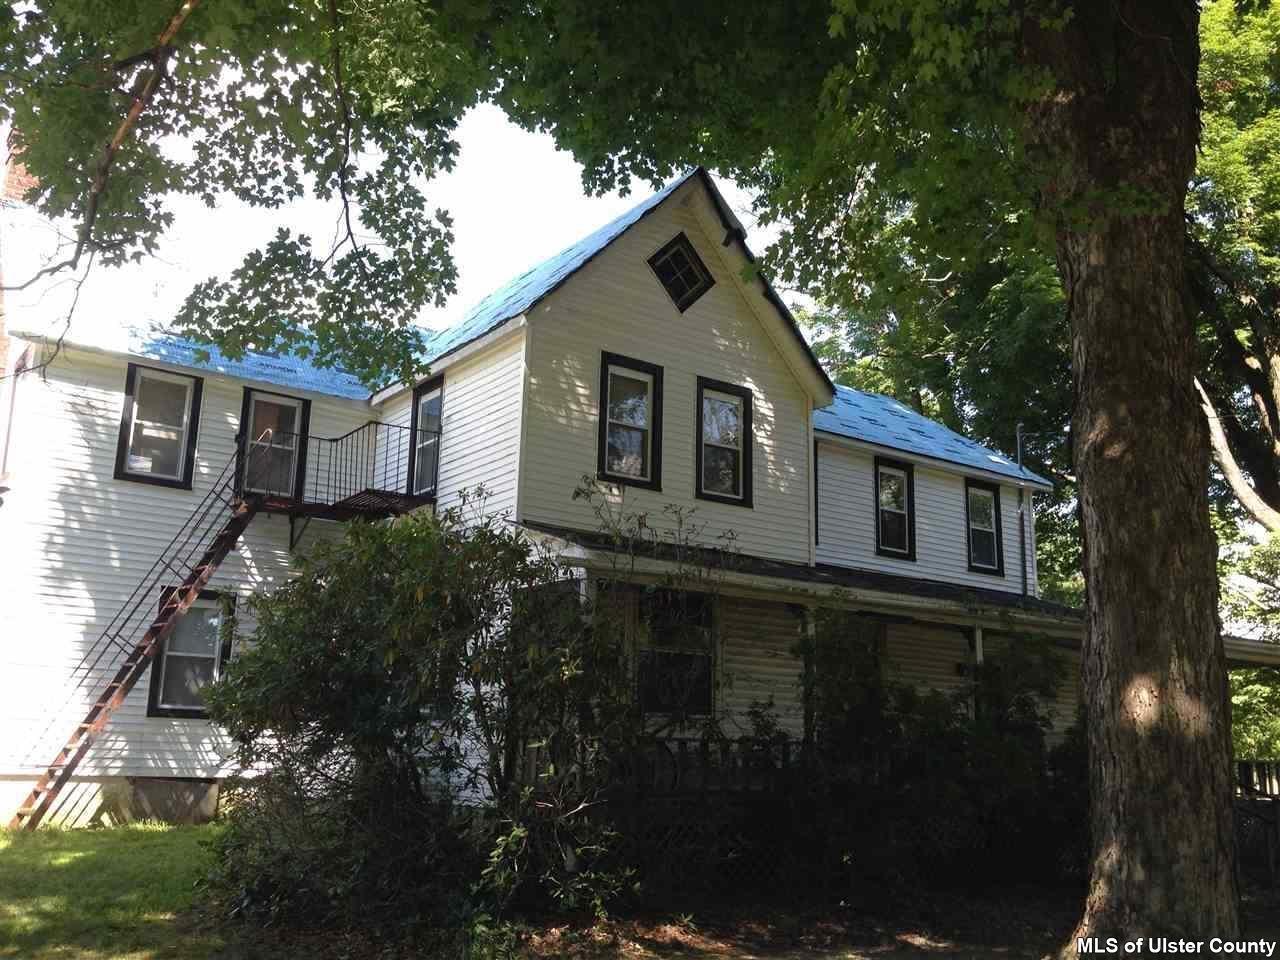 38 Samsonville Rd Kerhonkson Ny 12446 Income Investment 22